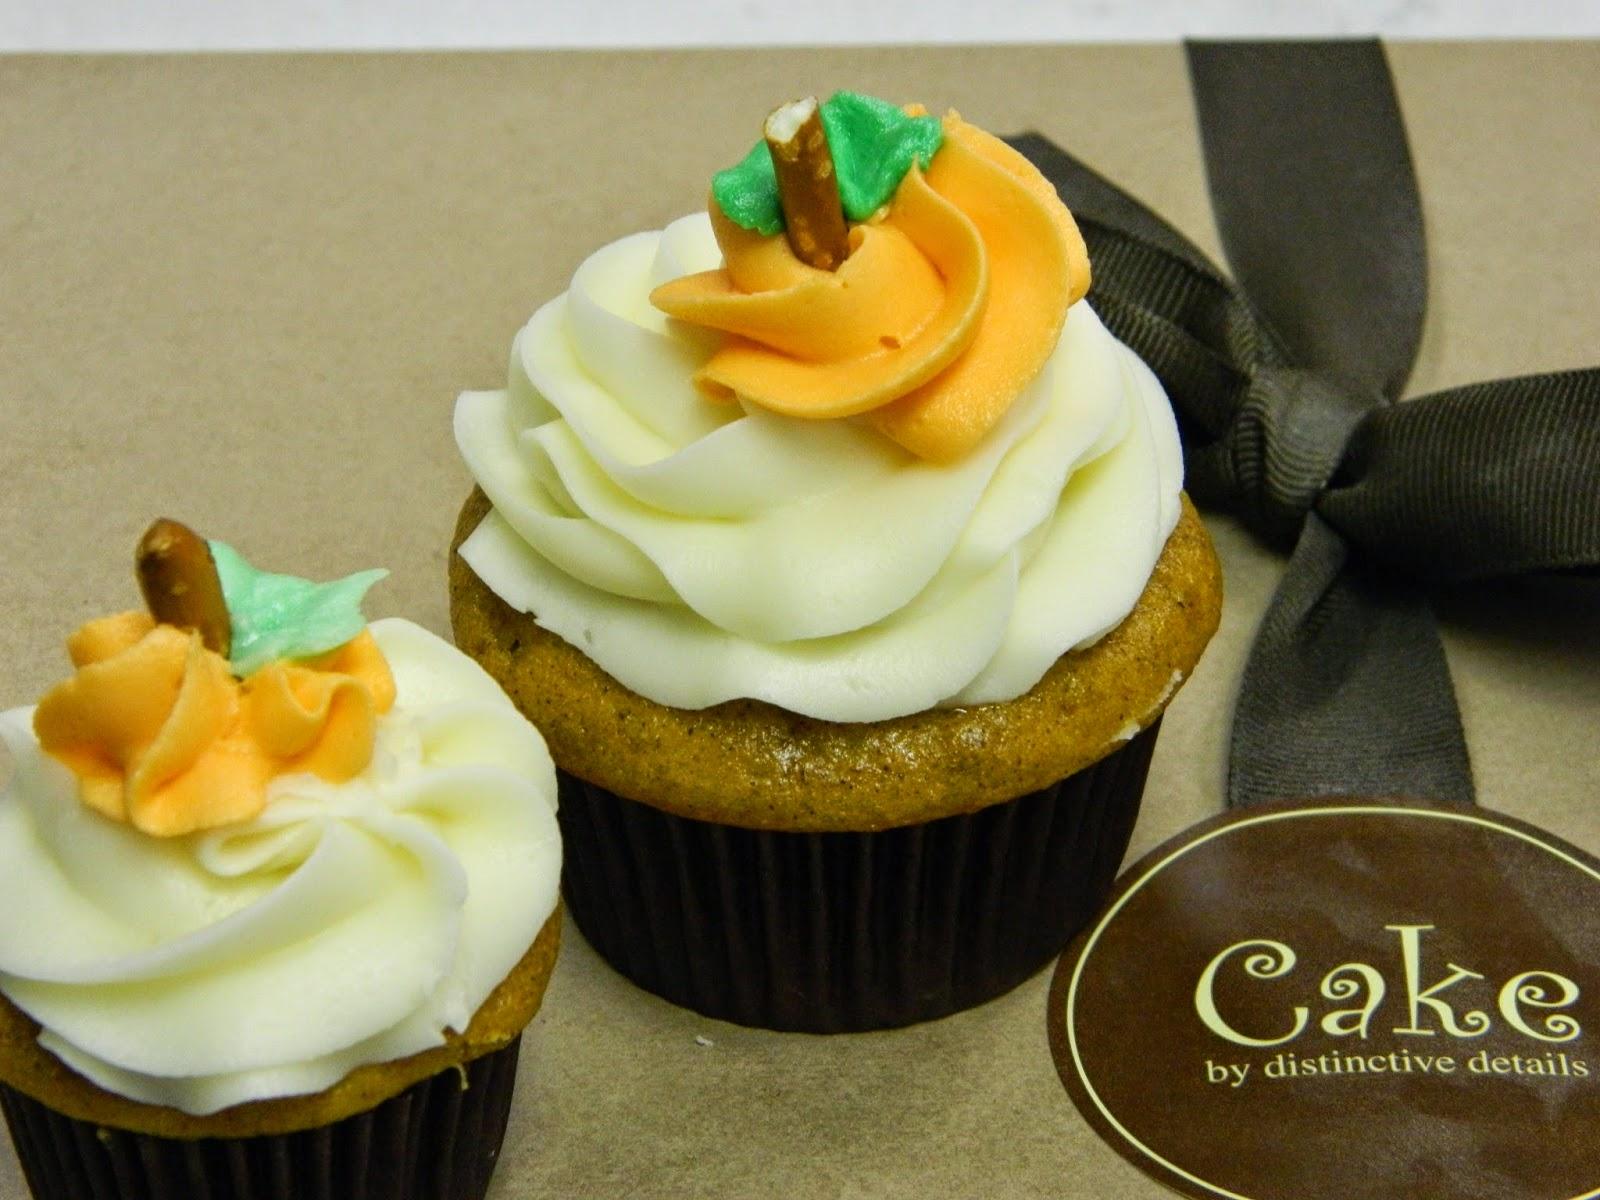 CAKE by distinctive details